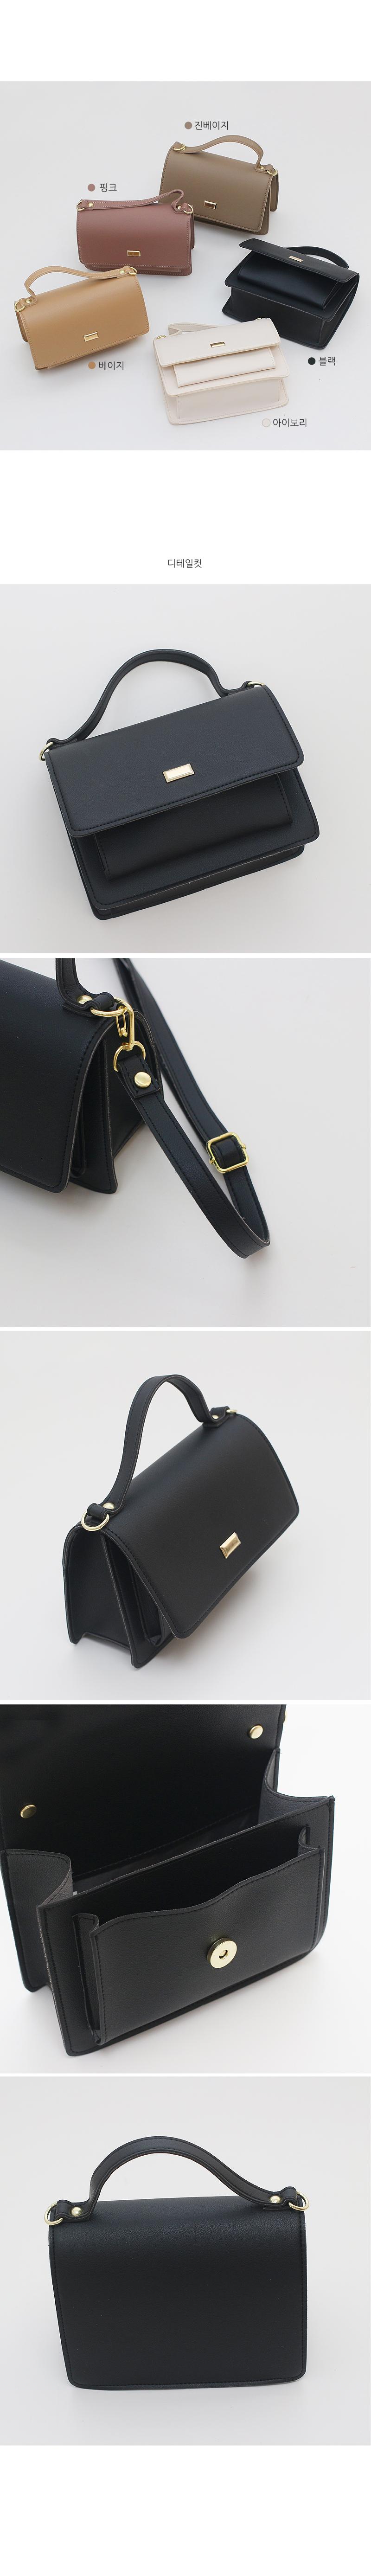 Bella square crossbody bag